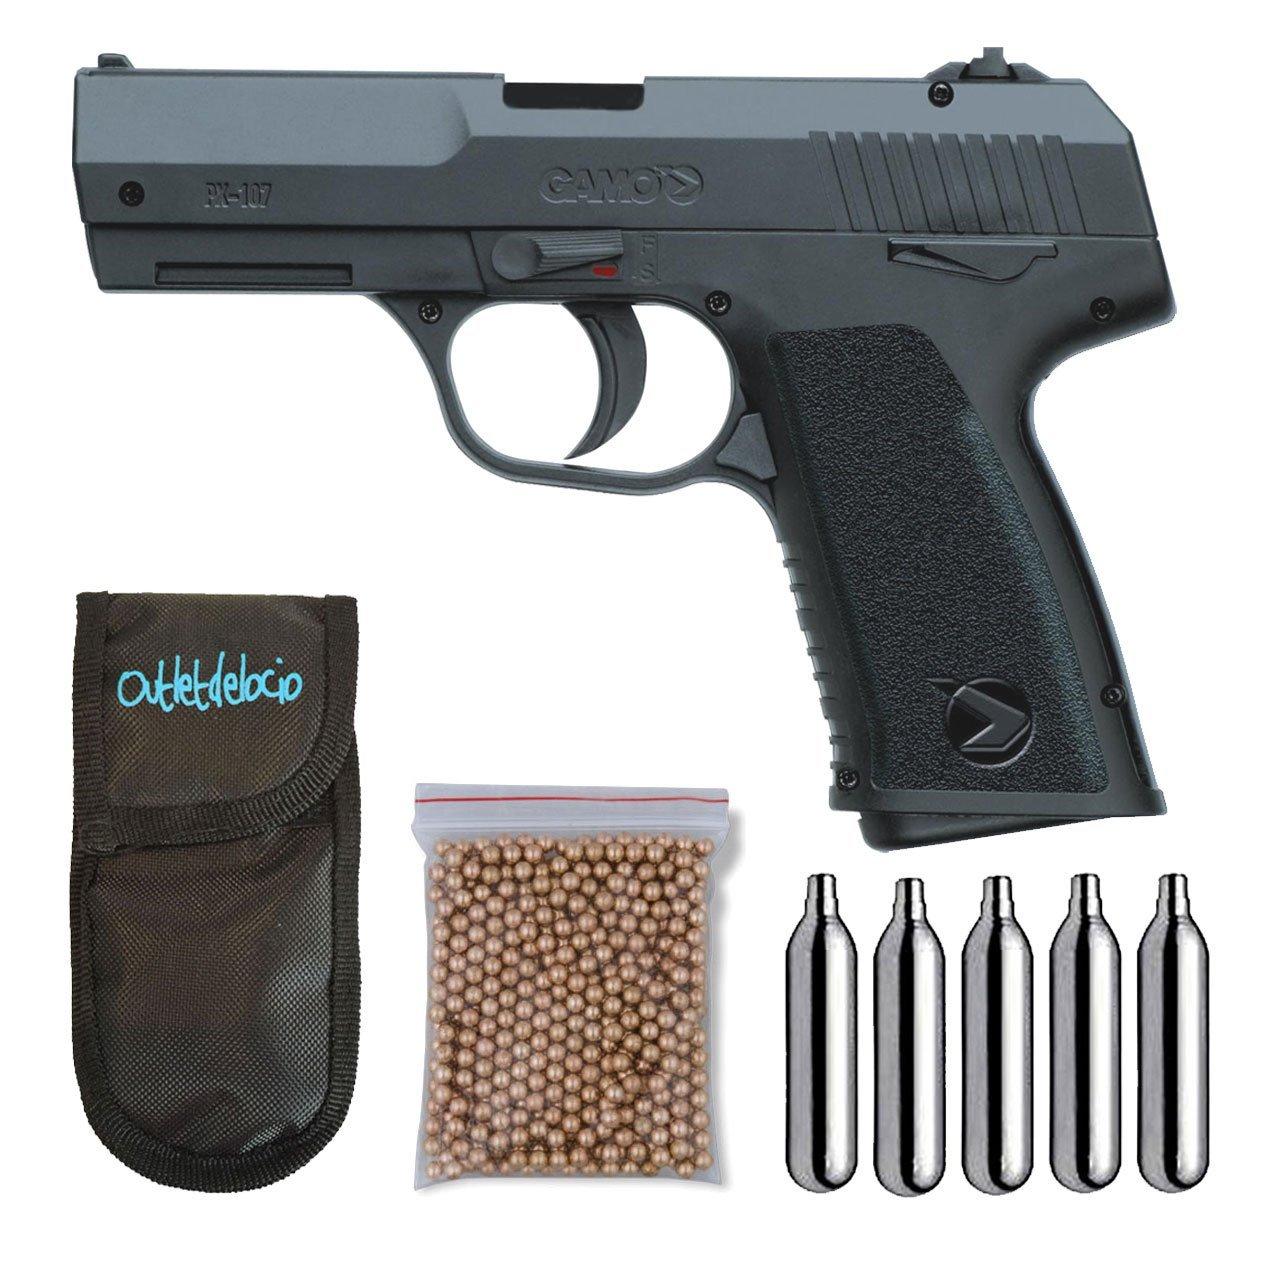 Pistola Perdigón Gamo PX-107 4, 5mm. + Funda Portabombonas + Balines + Bombonas co2. 23054/29318/38123